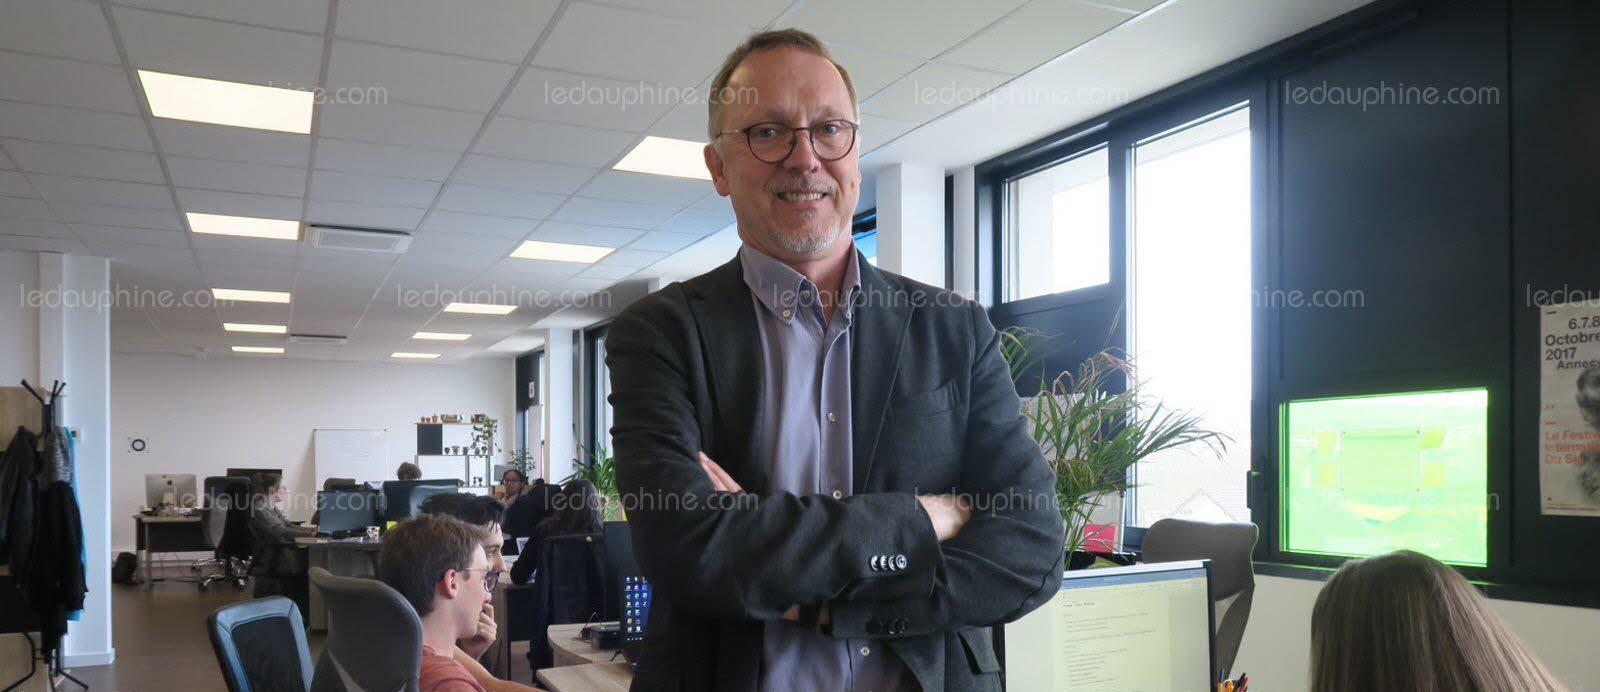 Startup aboutgoods company ouvre un bureau madrid - Bureau de change chambery ...